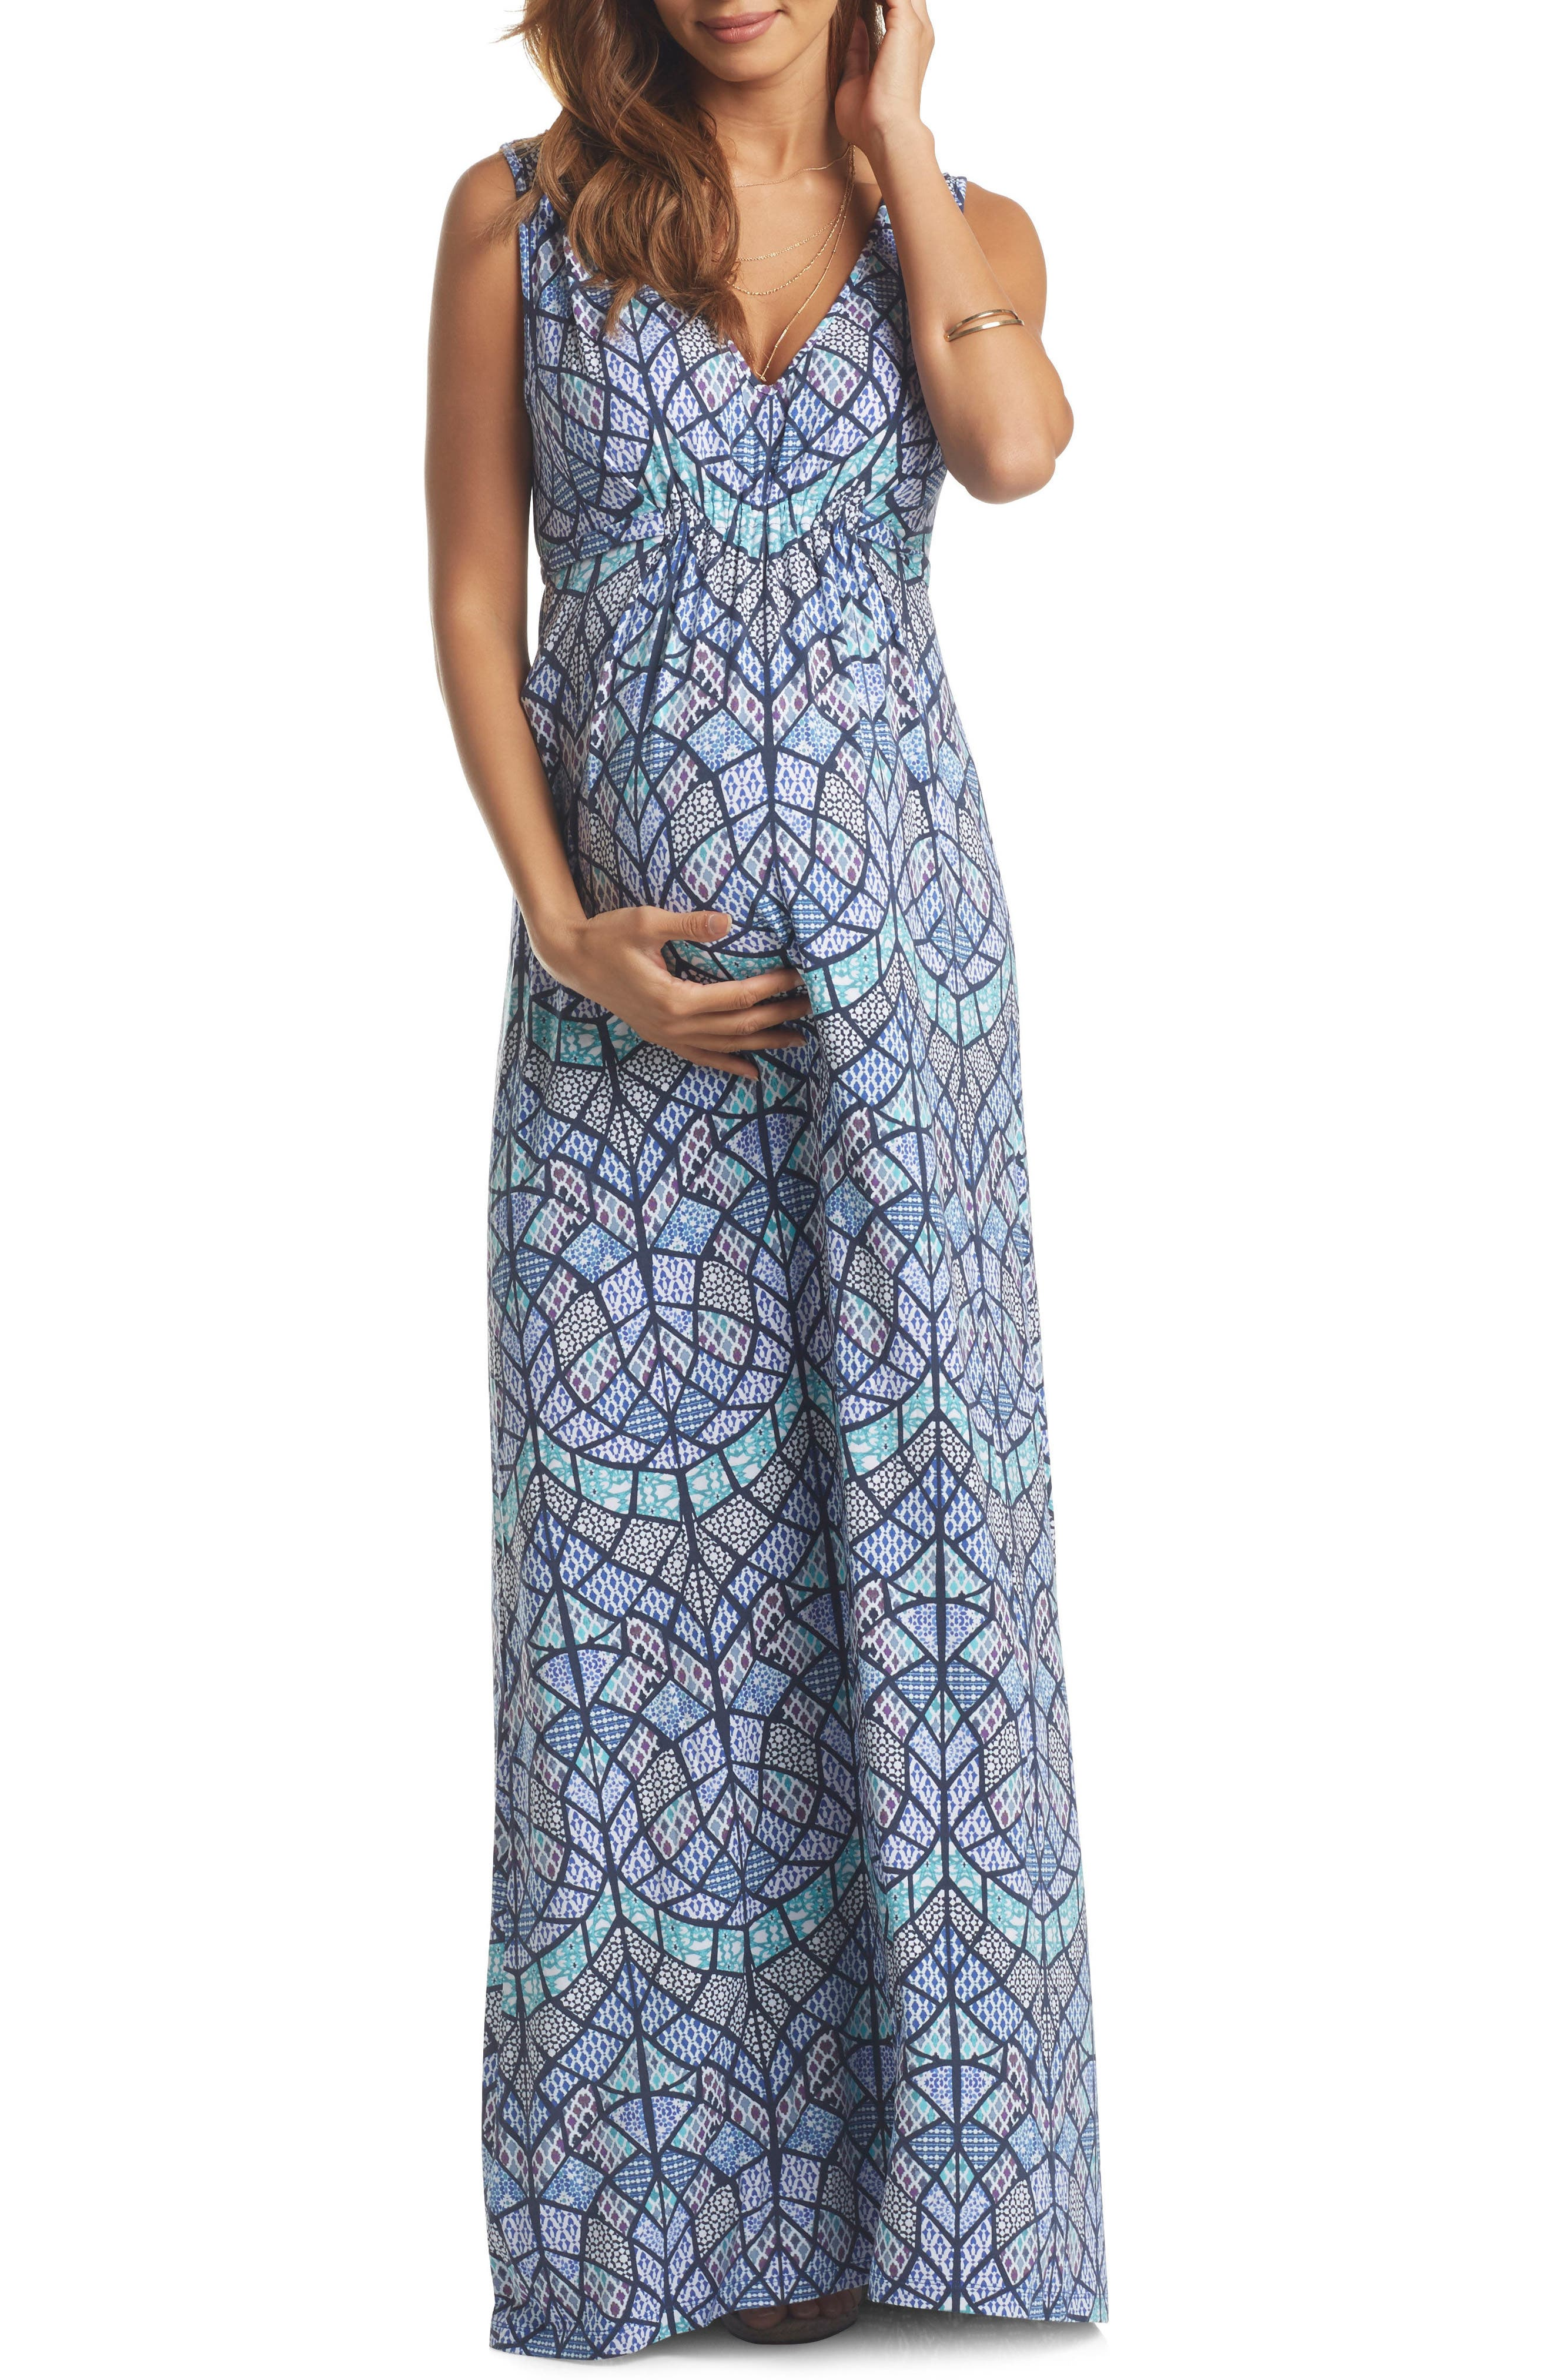 'Grecia' Print Jersey Maternity Maxi Dress,                             Main thumbnail 1, color,                             Tile Mosaic